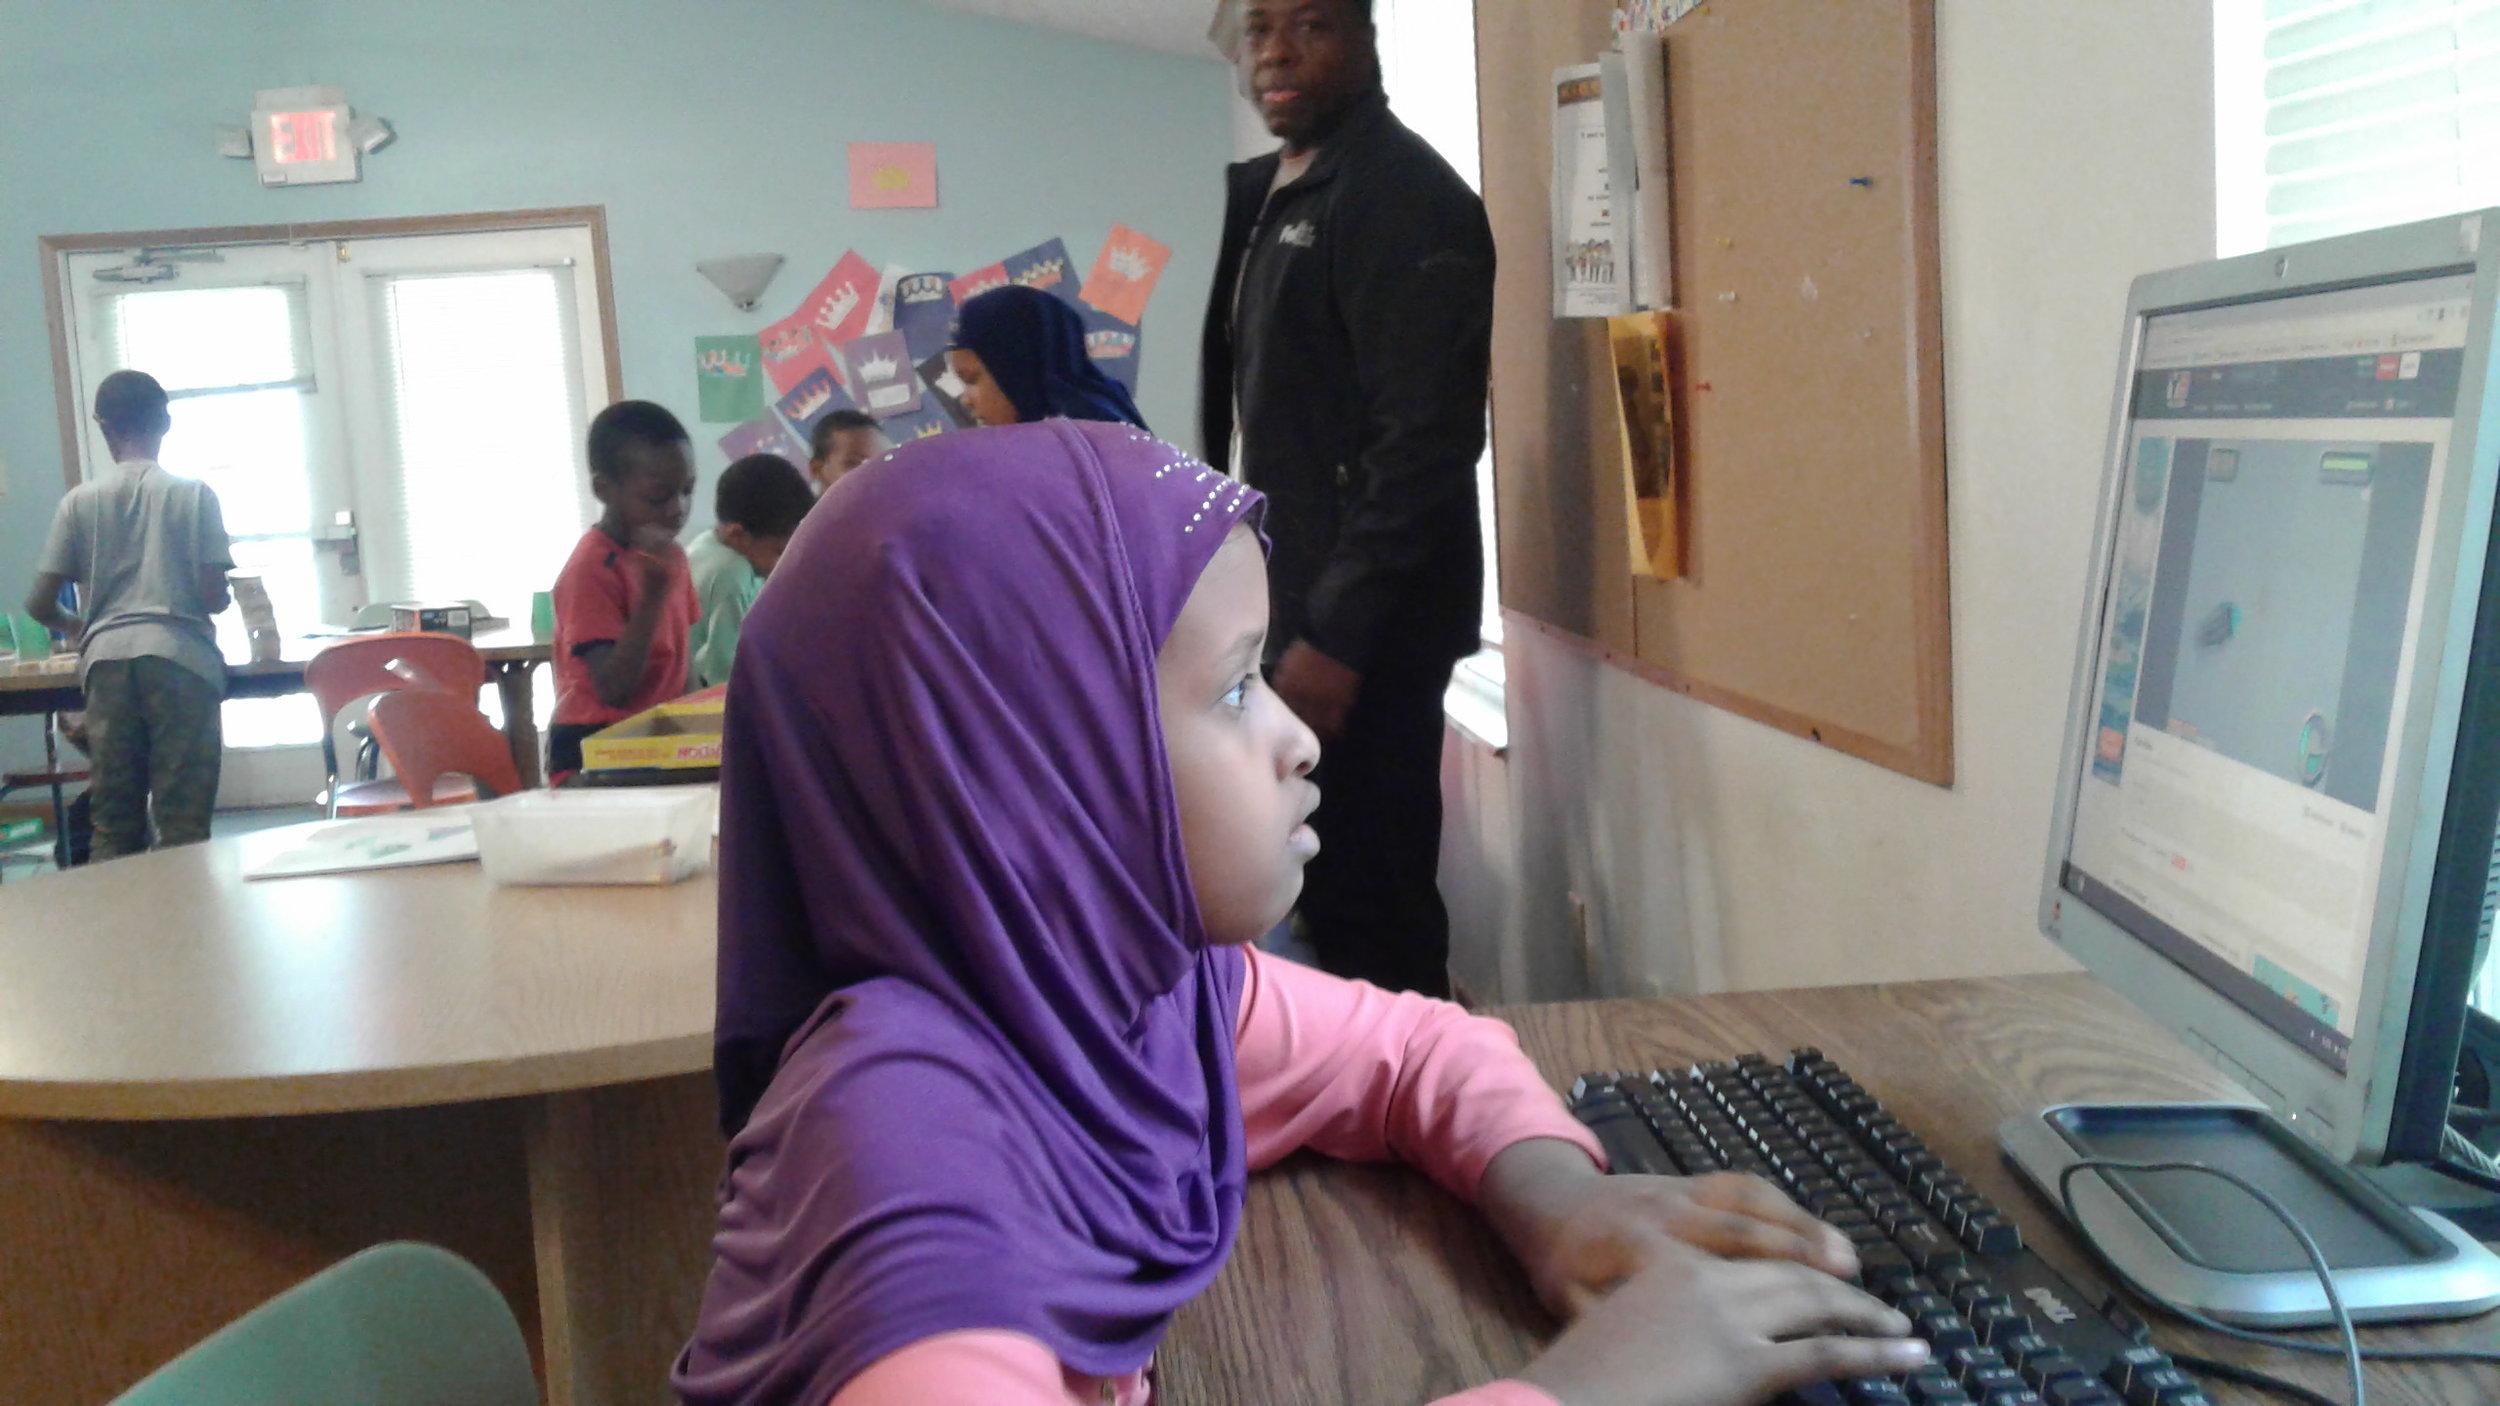 Ladan Yusuf plays computer game in Emerald Glen community center.